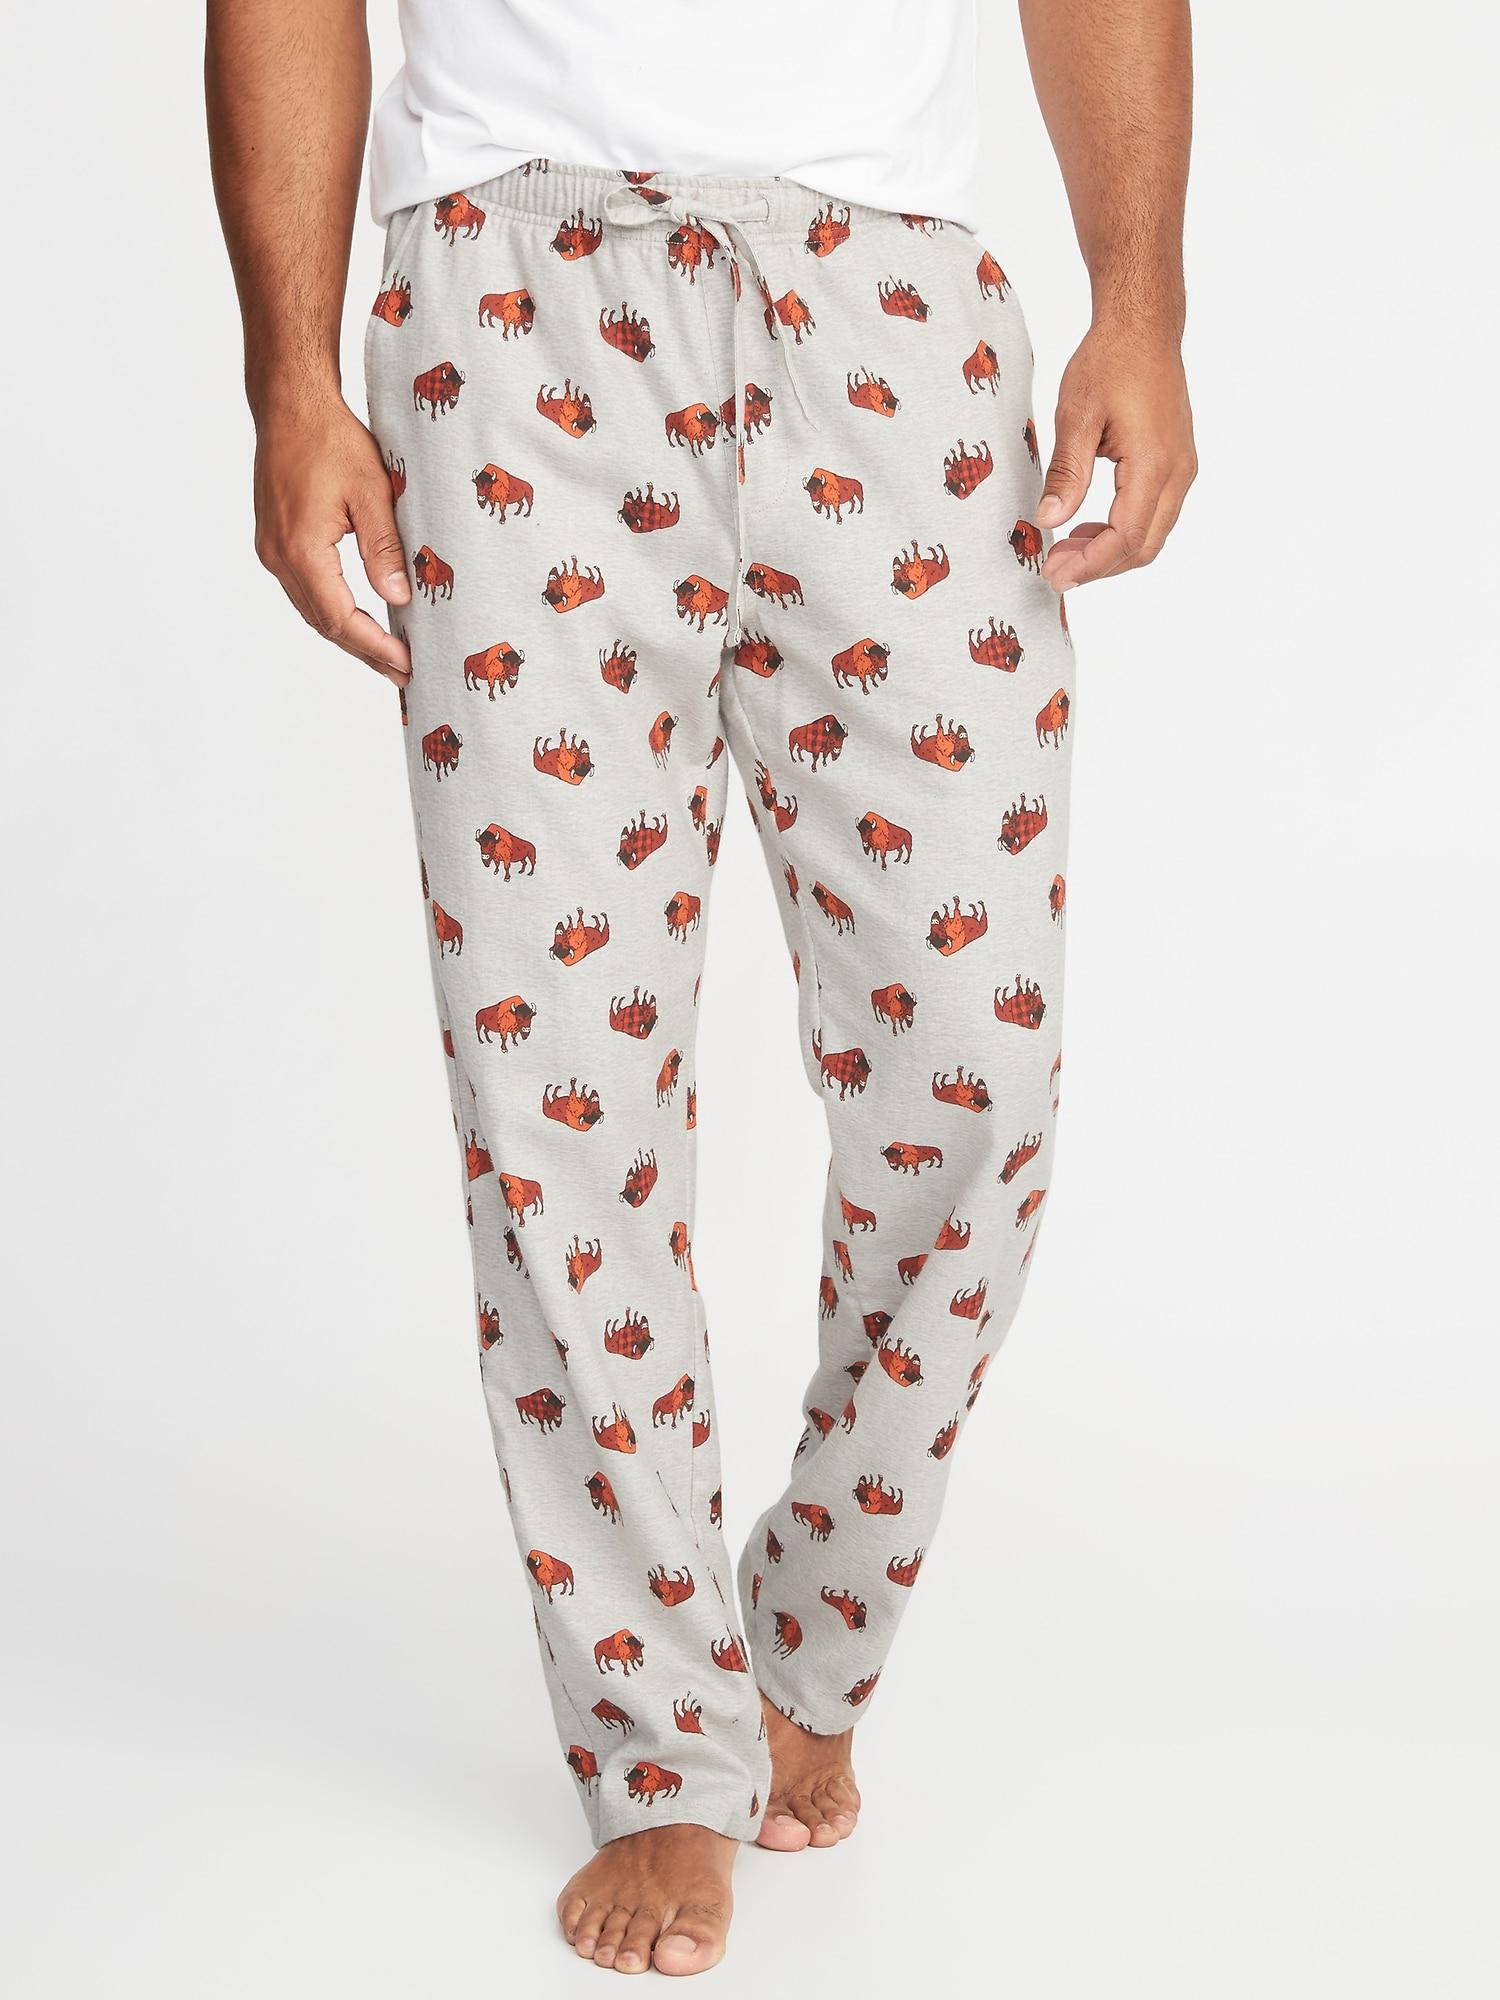 Patterned Flannel Sleep Pants for Men  bdf6b8c50